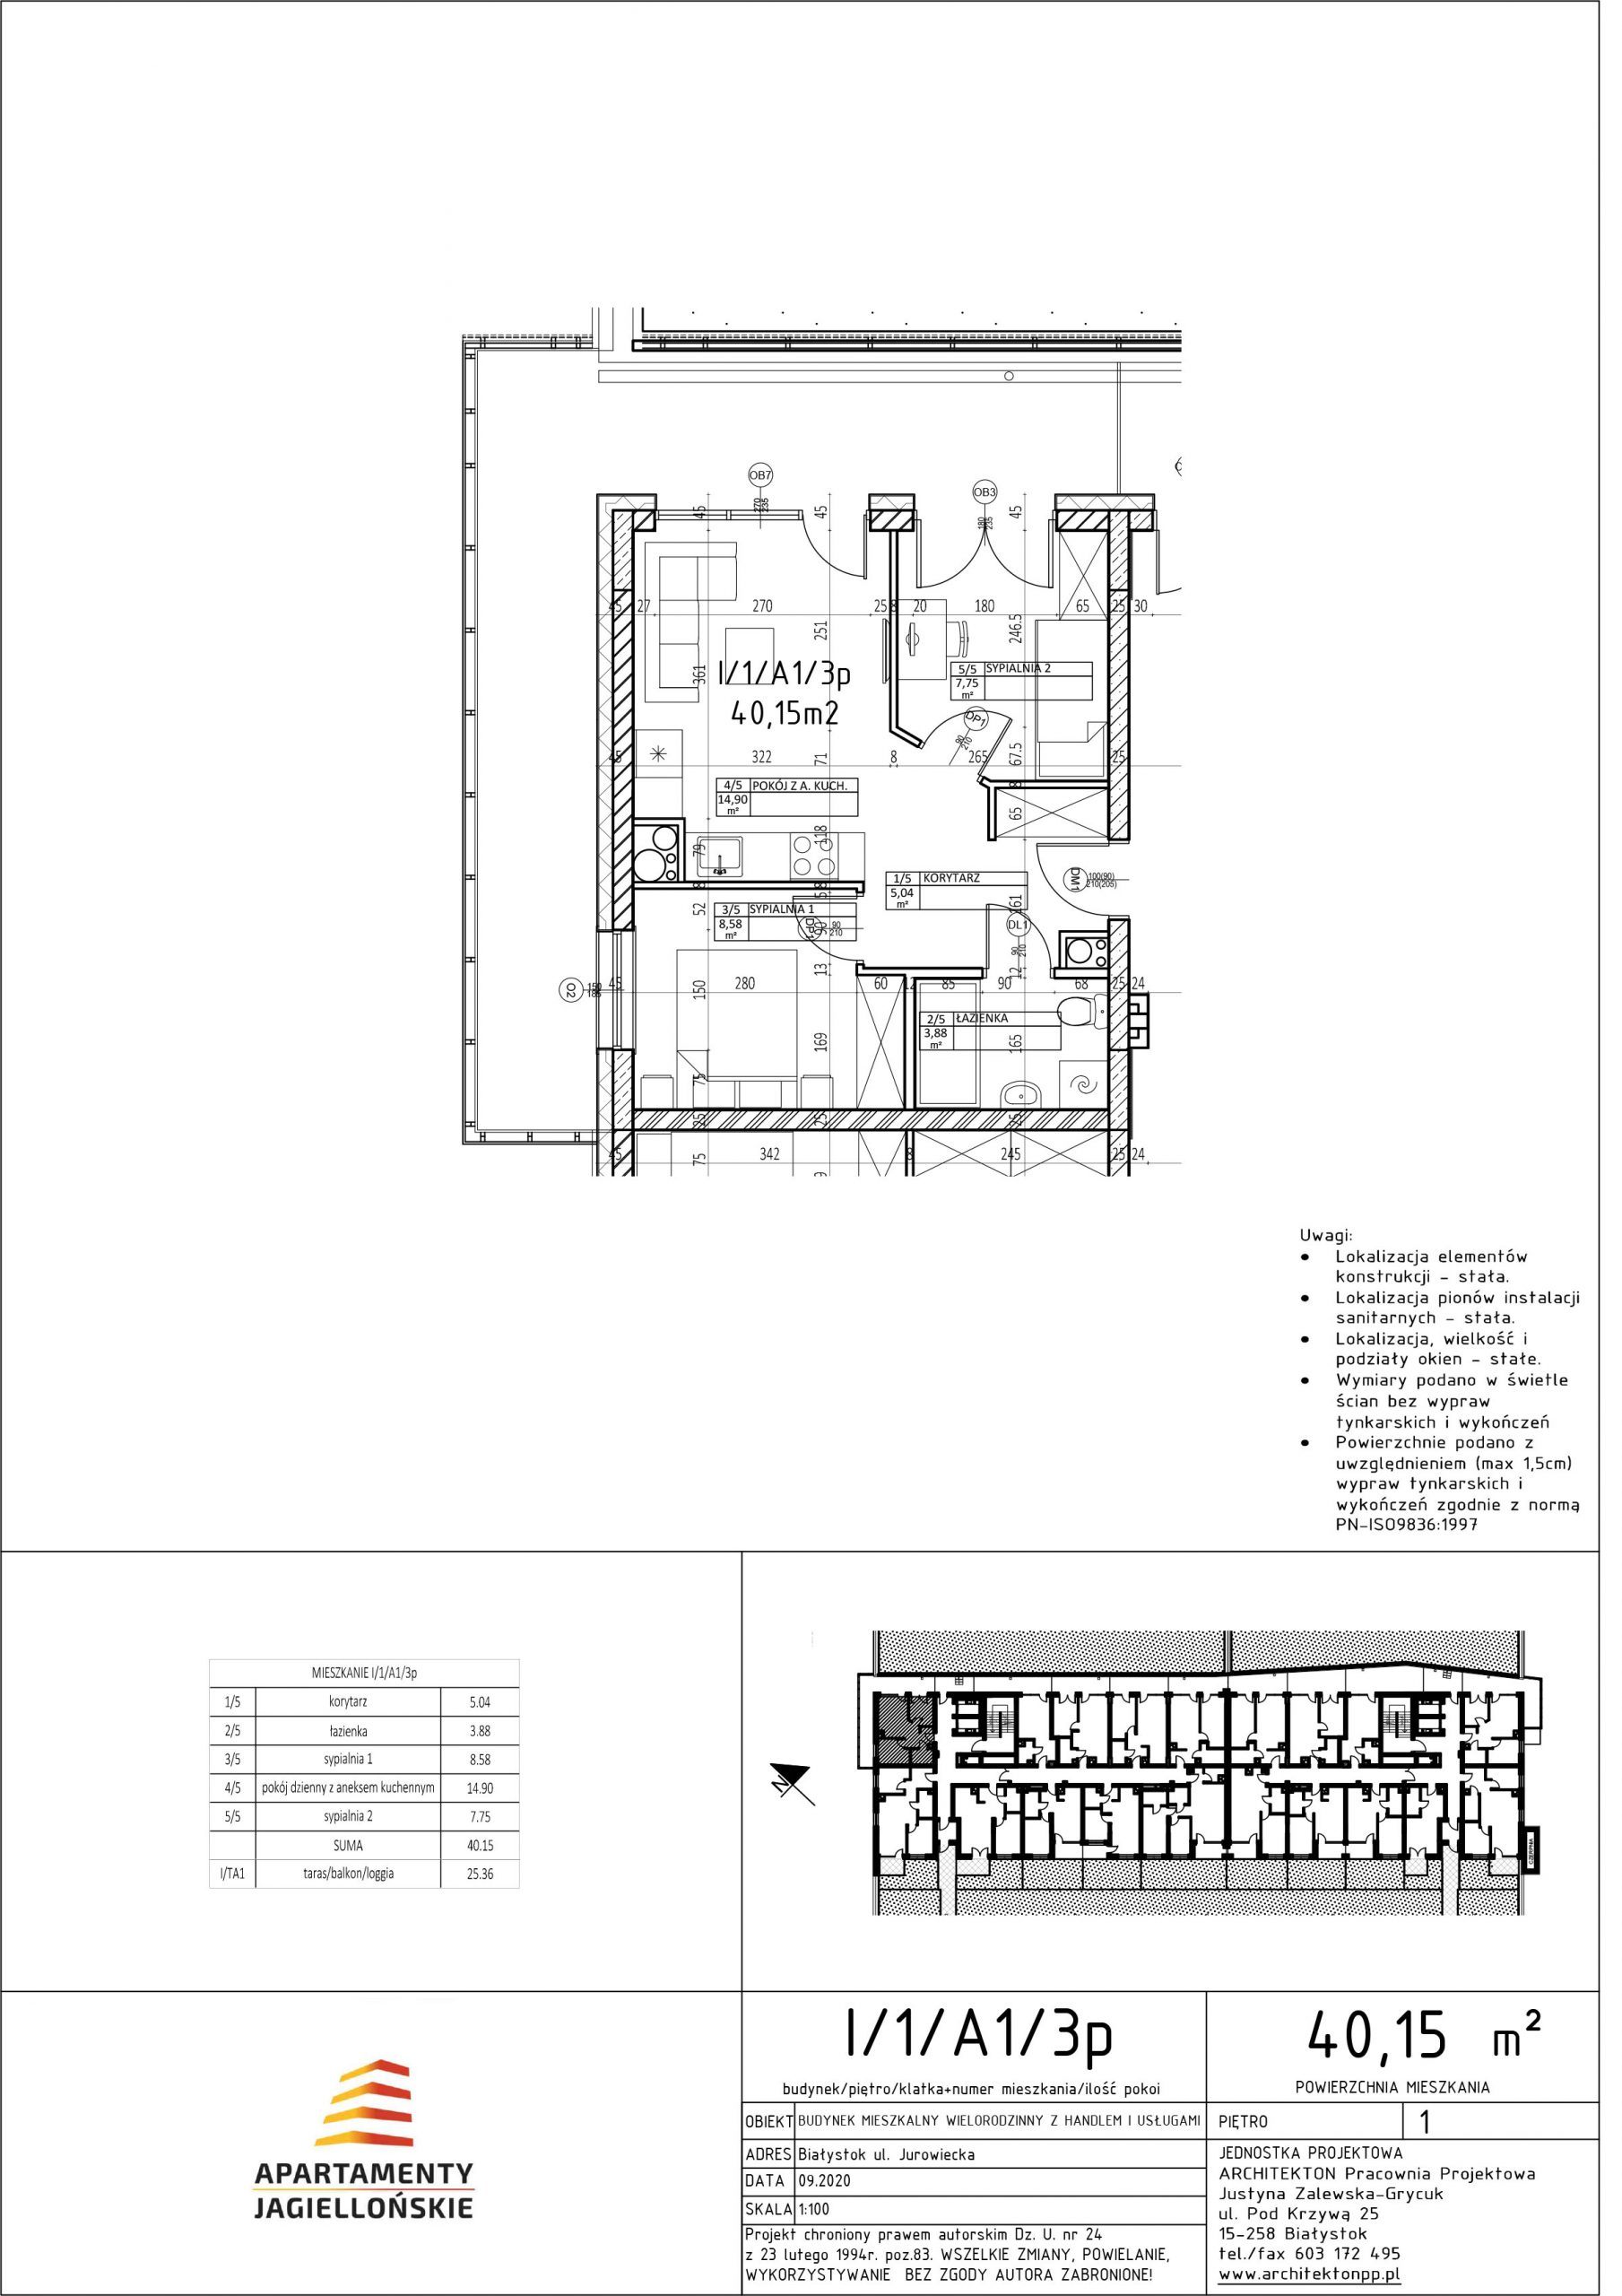 https://apartamentyjagiellonskie.pl/wp-content/uploads/2020/08/01-scaled.jpg